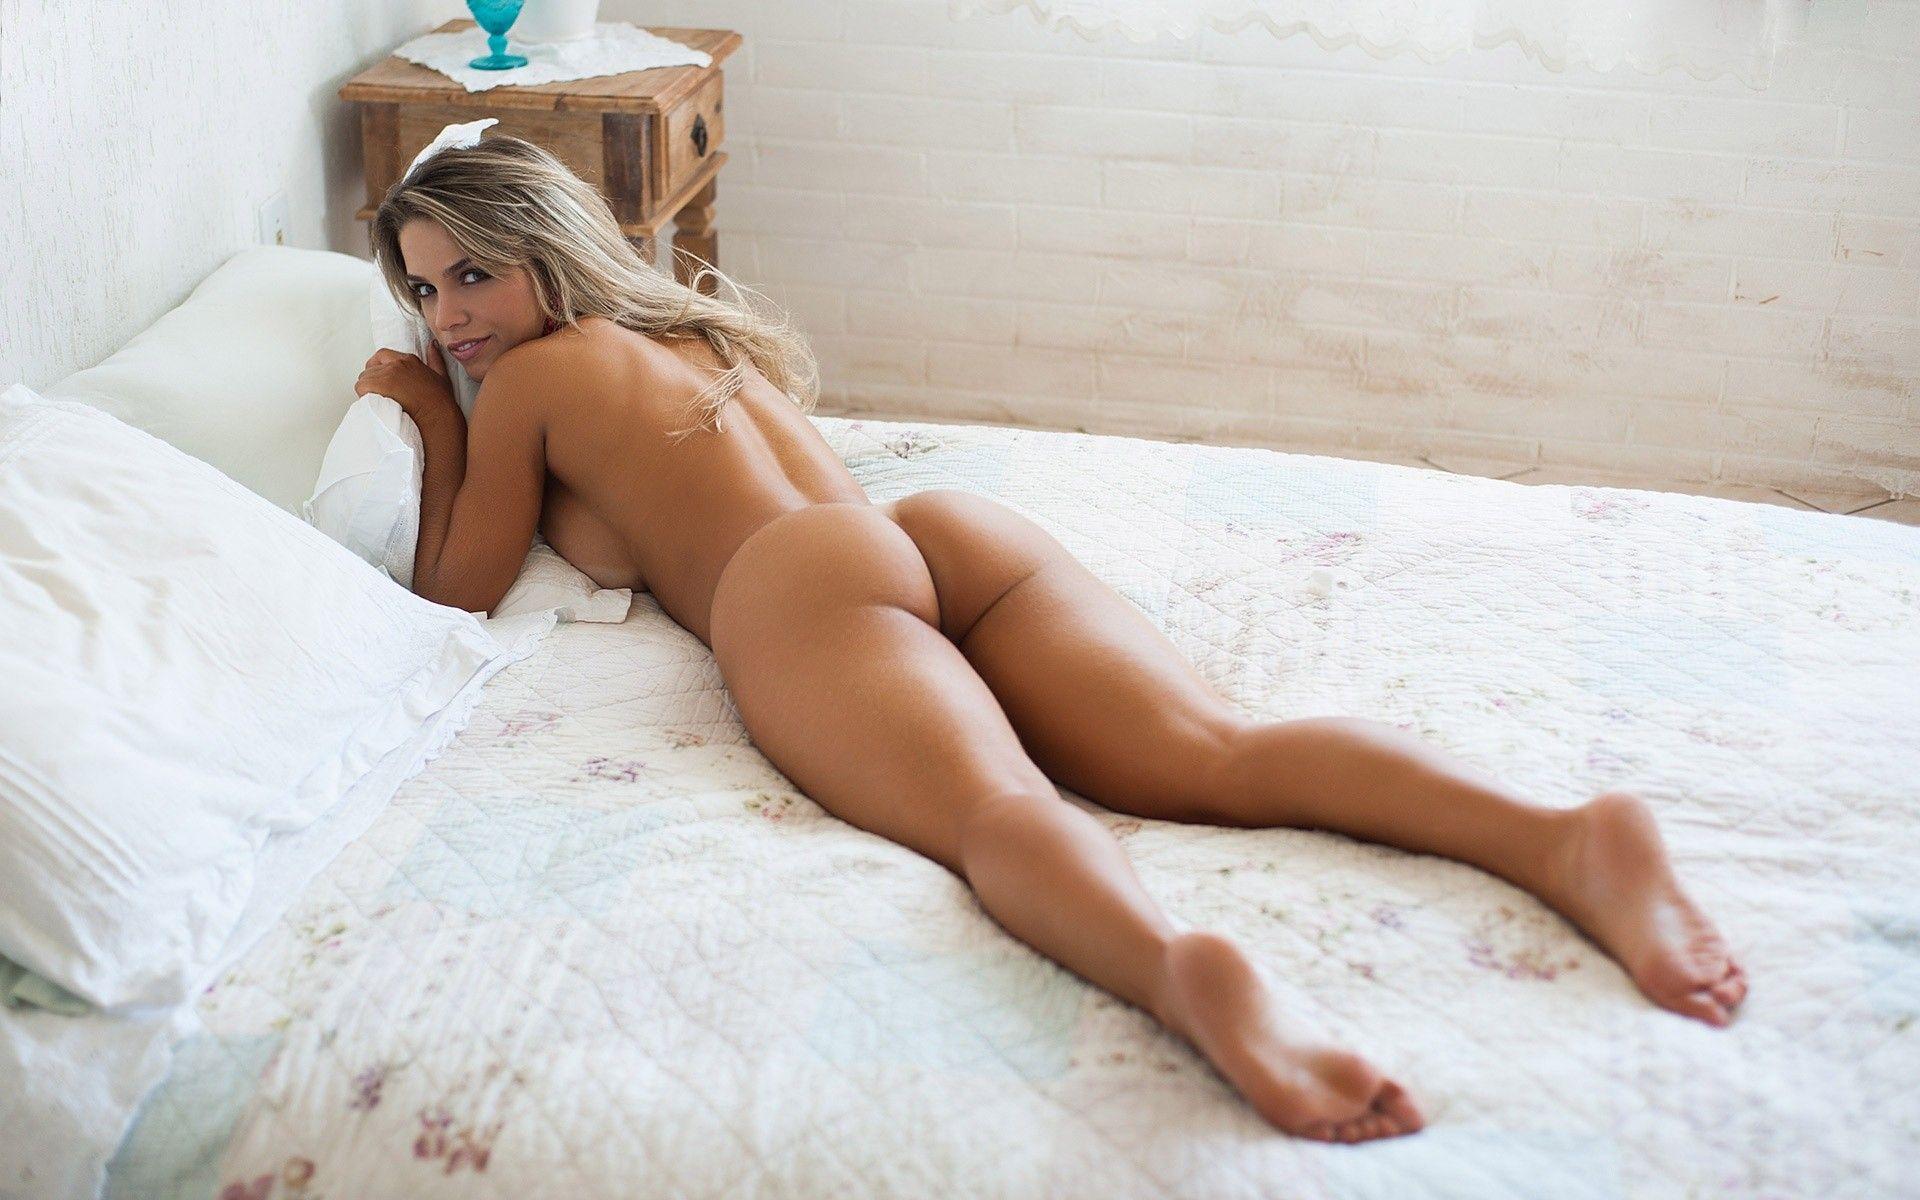 Explicit glamour porn wallpaper